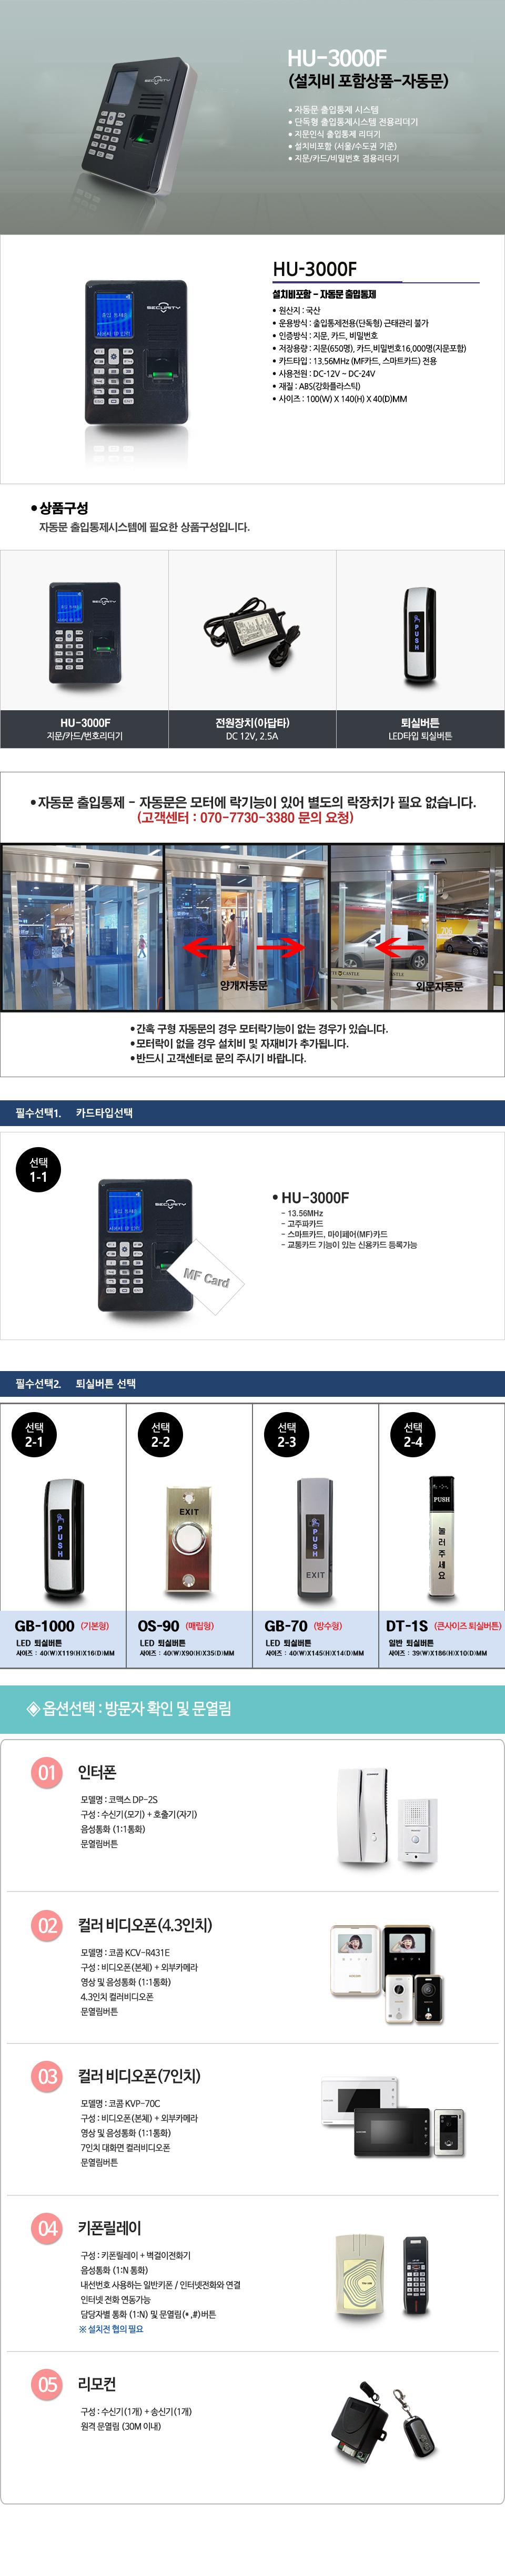 HU-3000F설치비포함작업-자동문.jpg